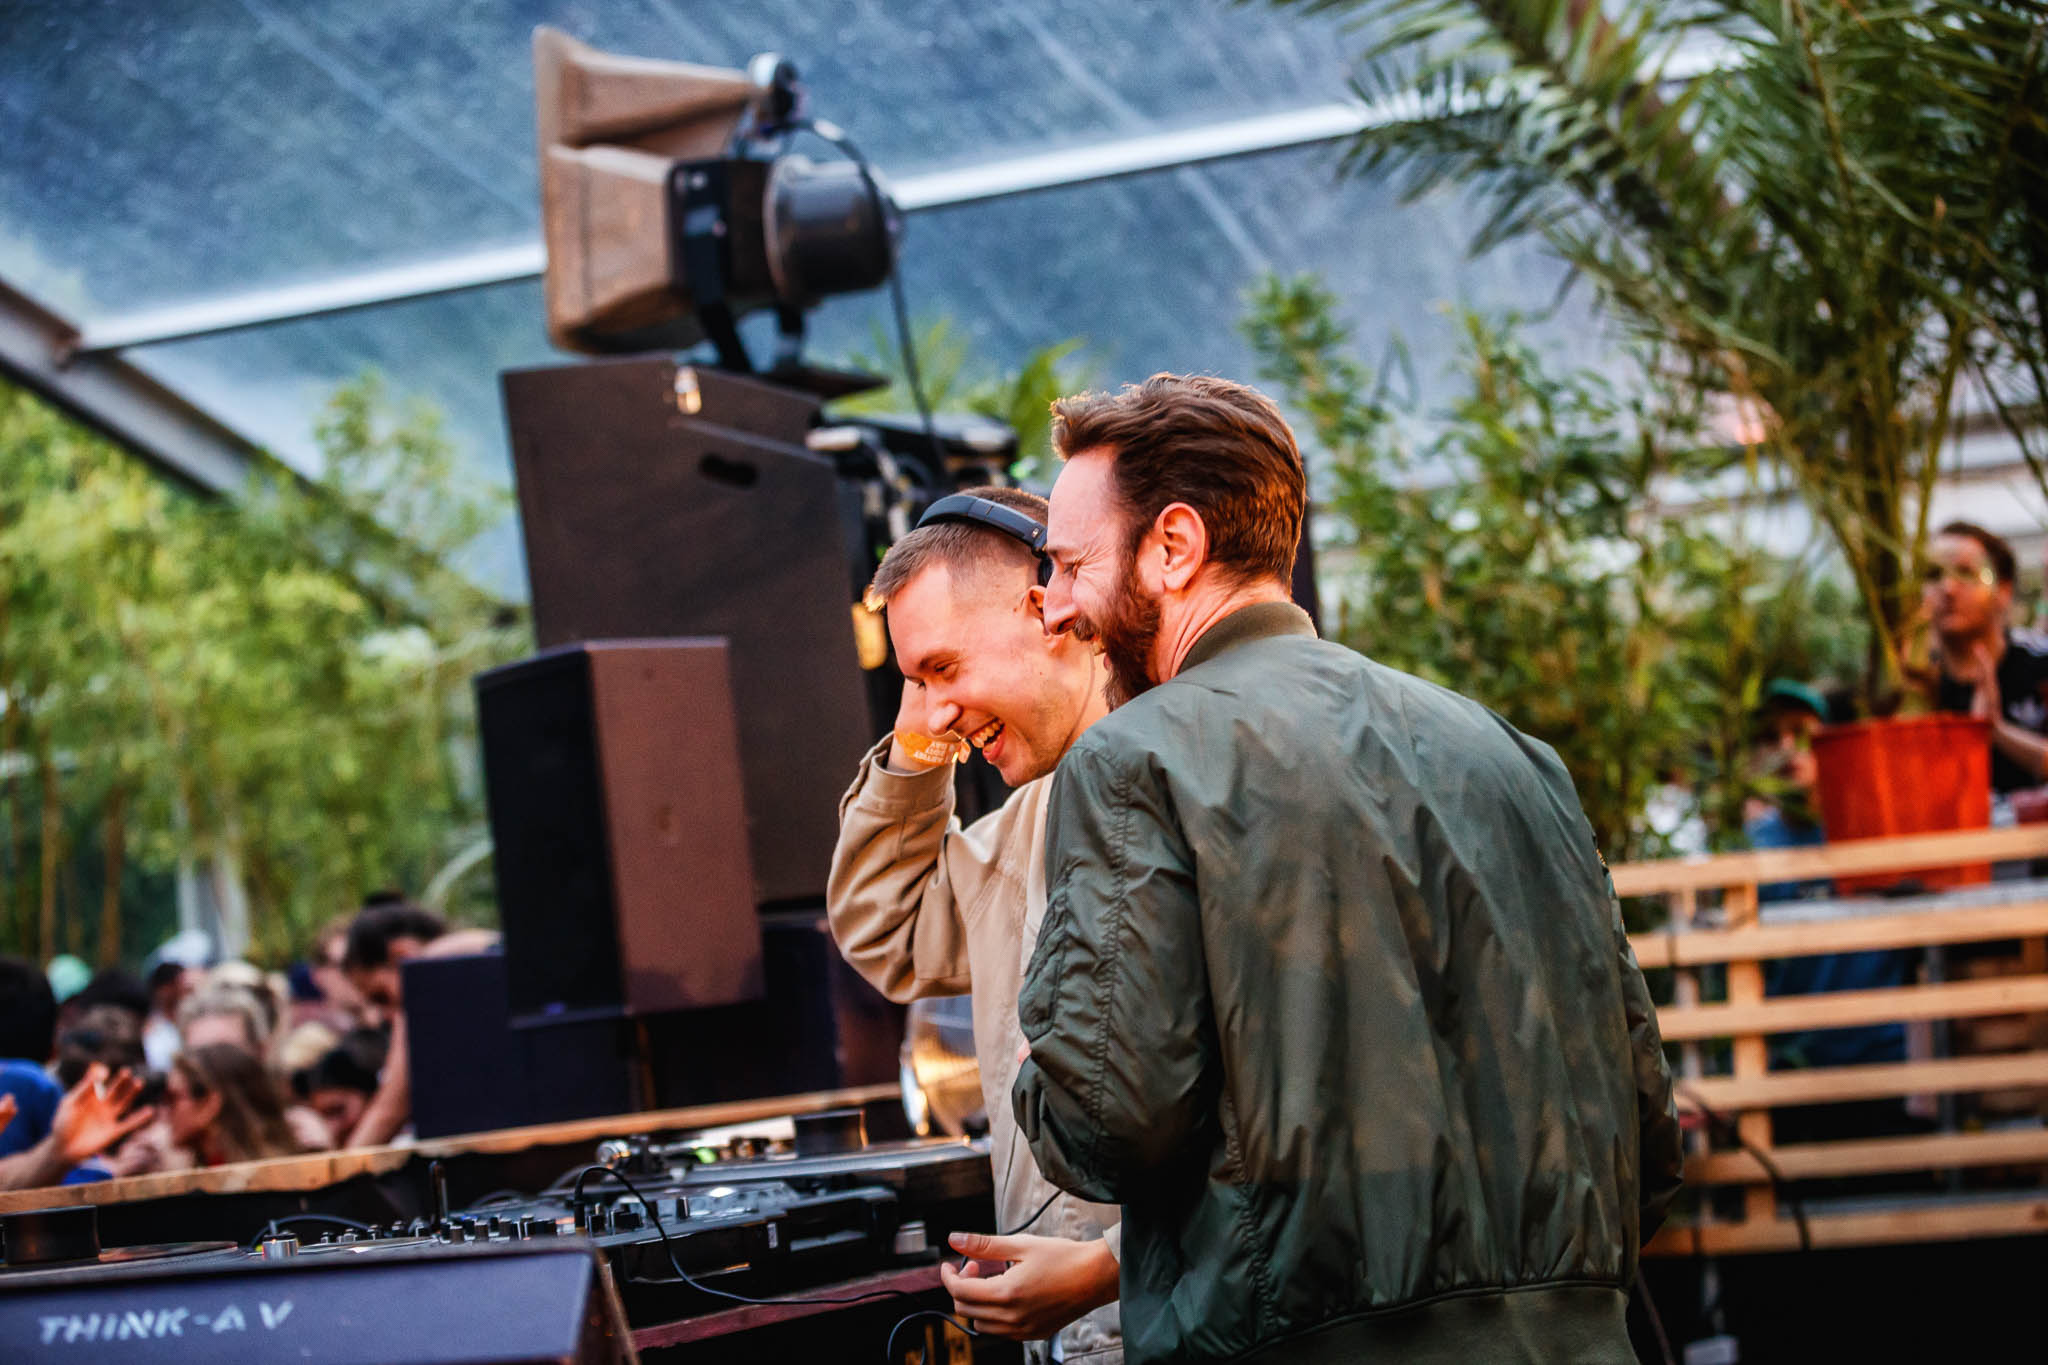 Joy Orbison & Jon K - Dekmantel Festival 2017 - Day 4 (credits - Bart Heemskerk)